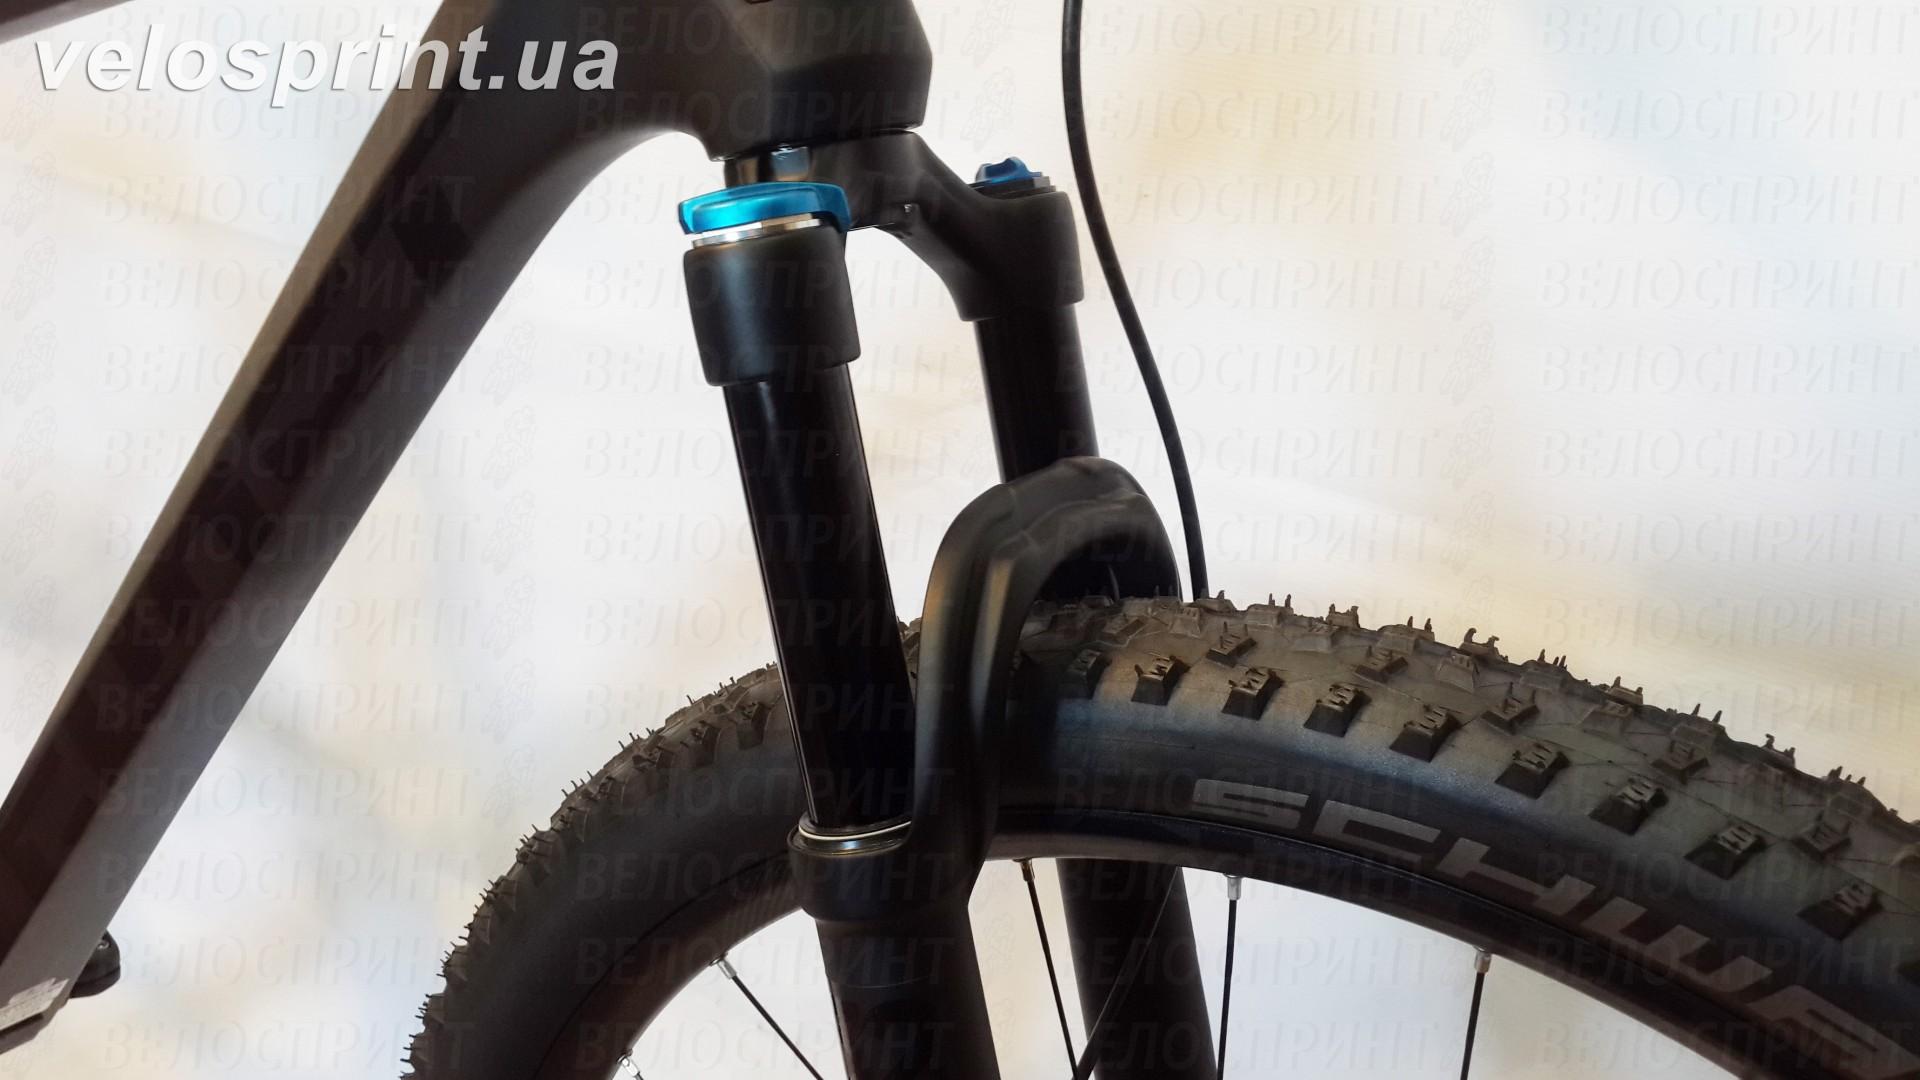 Велосипед GHOST Lector 6 LC 29 titaniumgrey/nightblack/riotgreen вилка год 2017